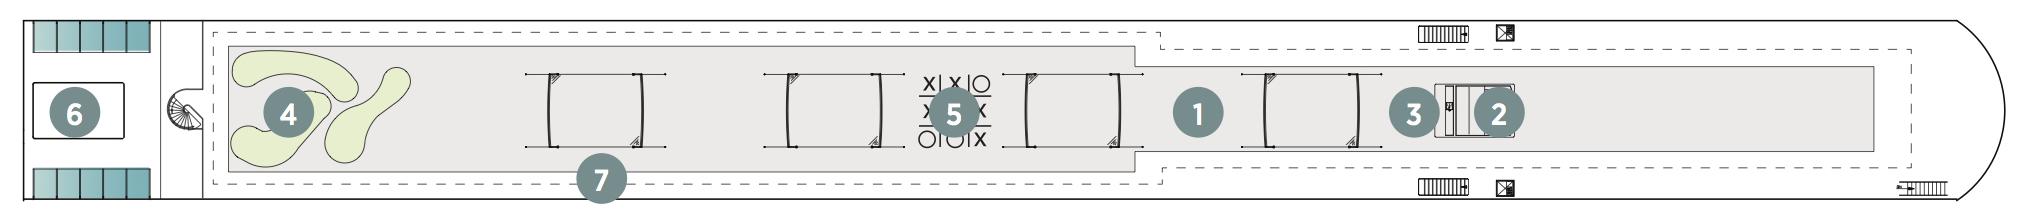 Emerald Dawn-deckplan-Sun Deck